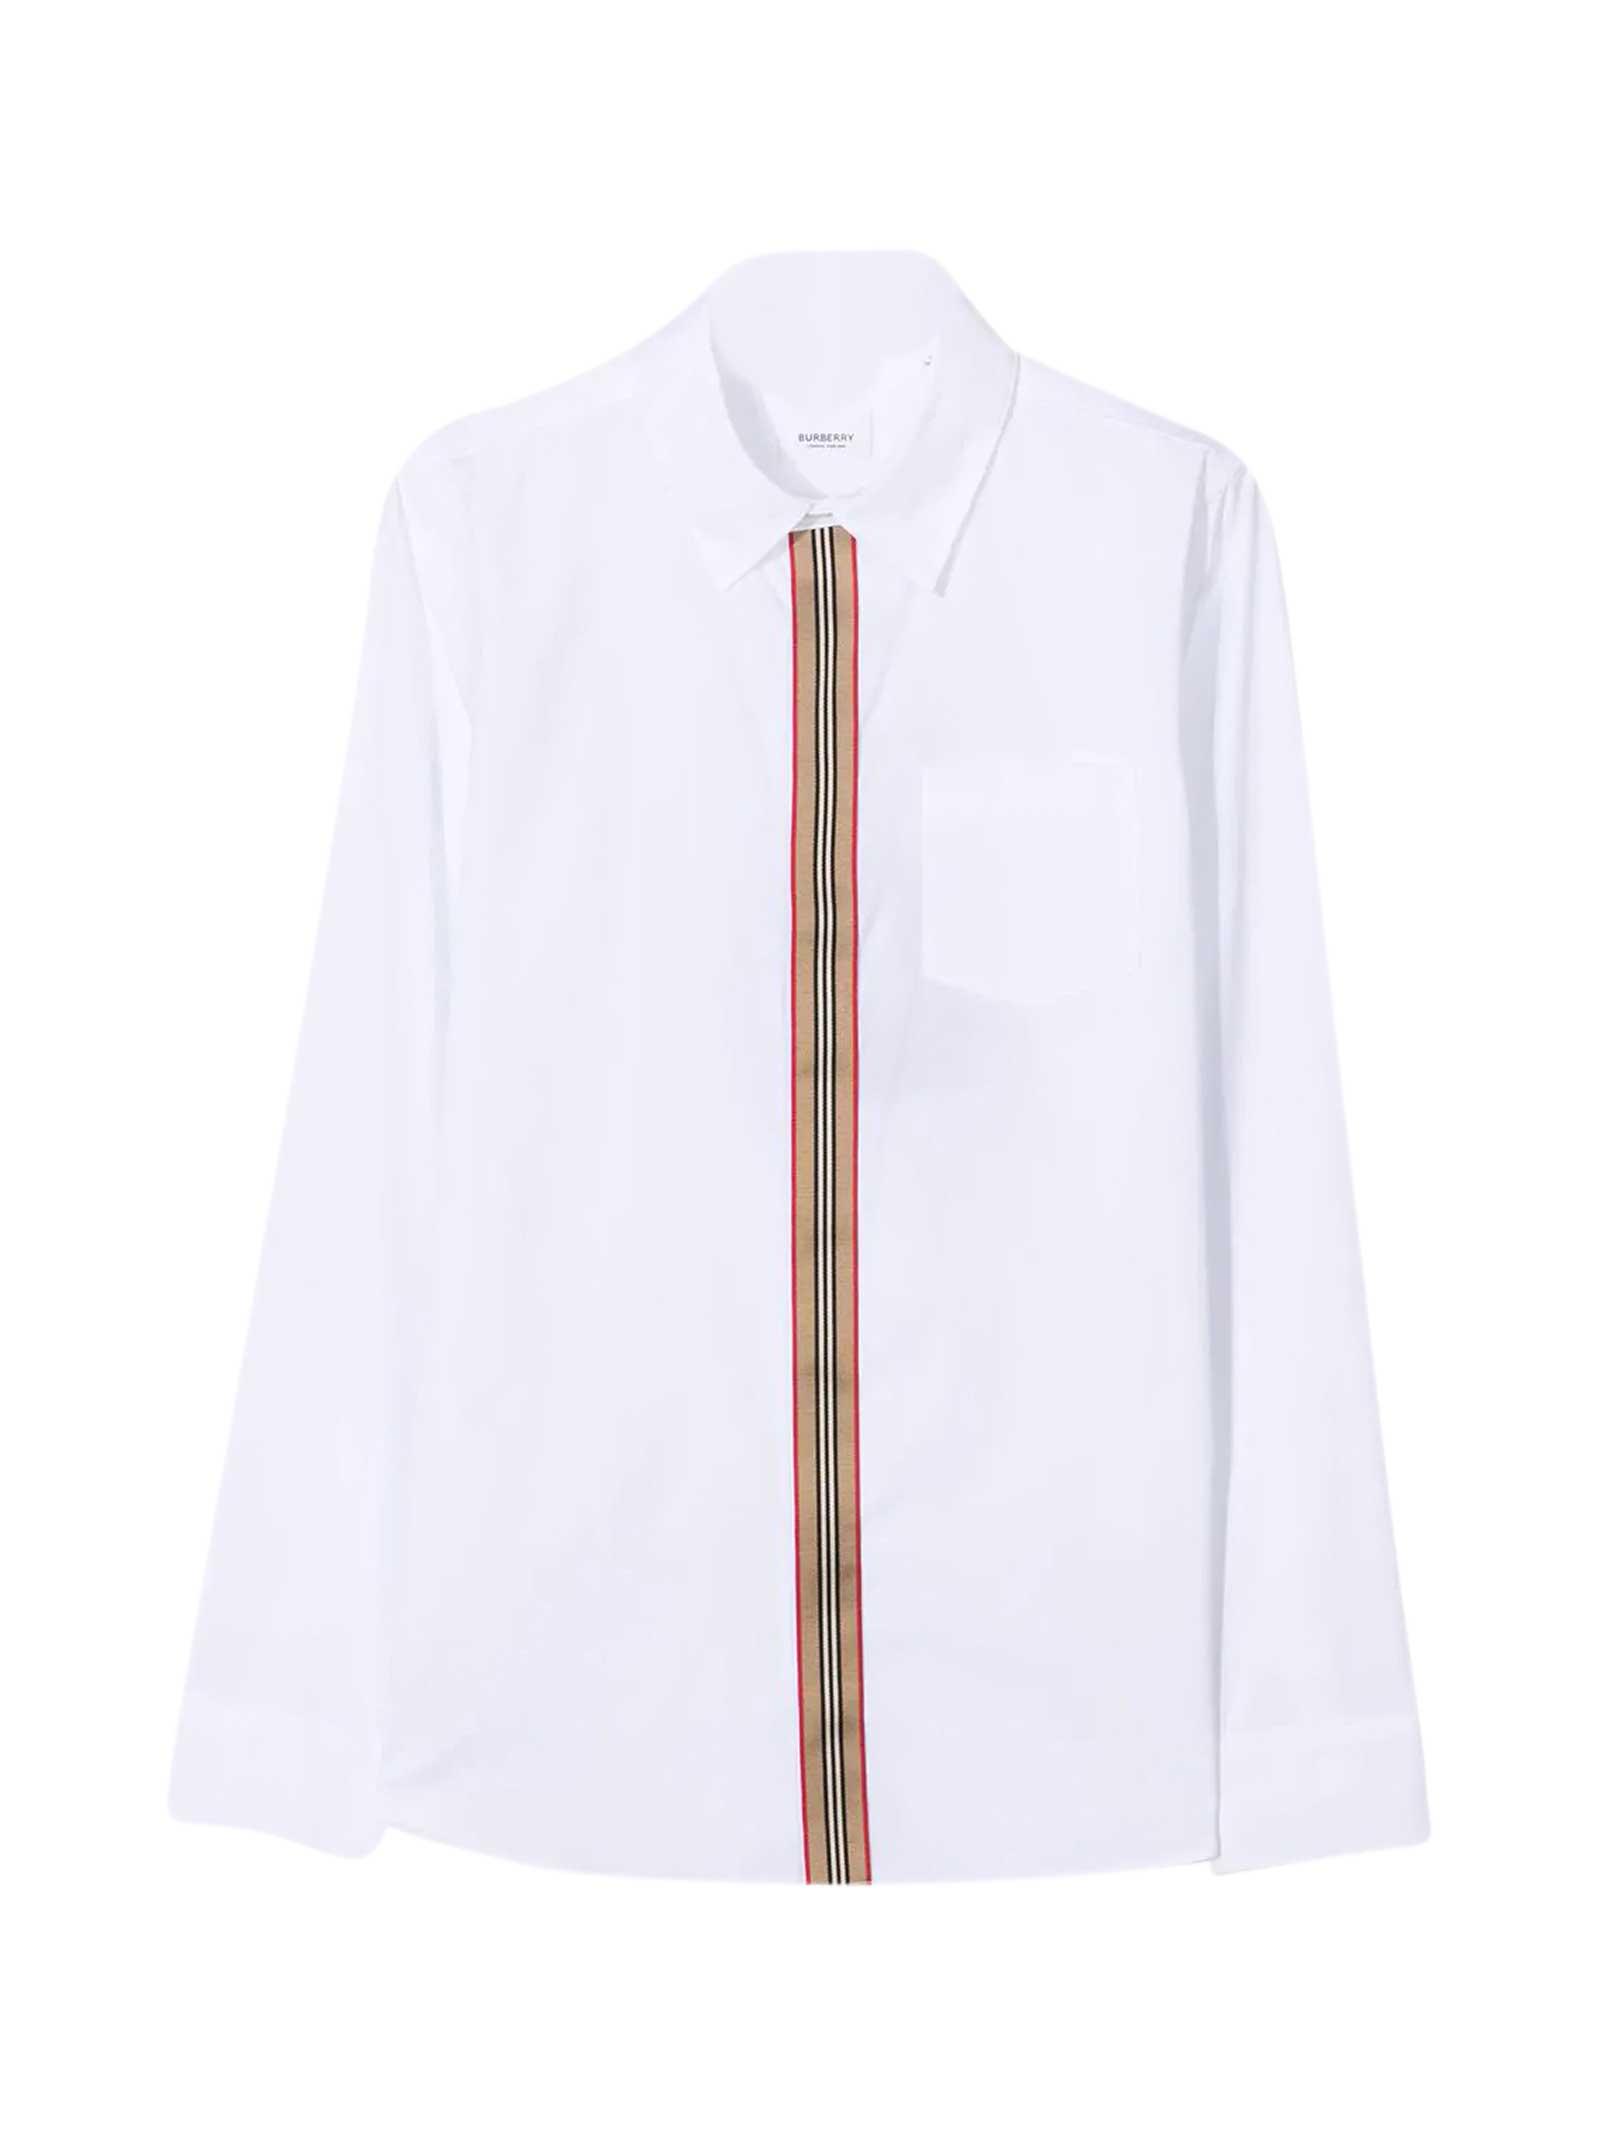 Burberry White Teen Shirt In Bianco